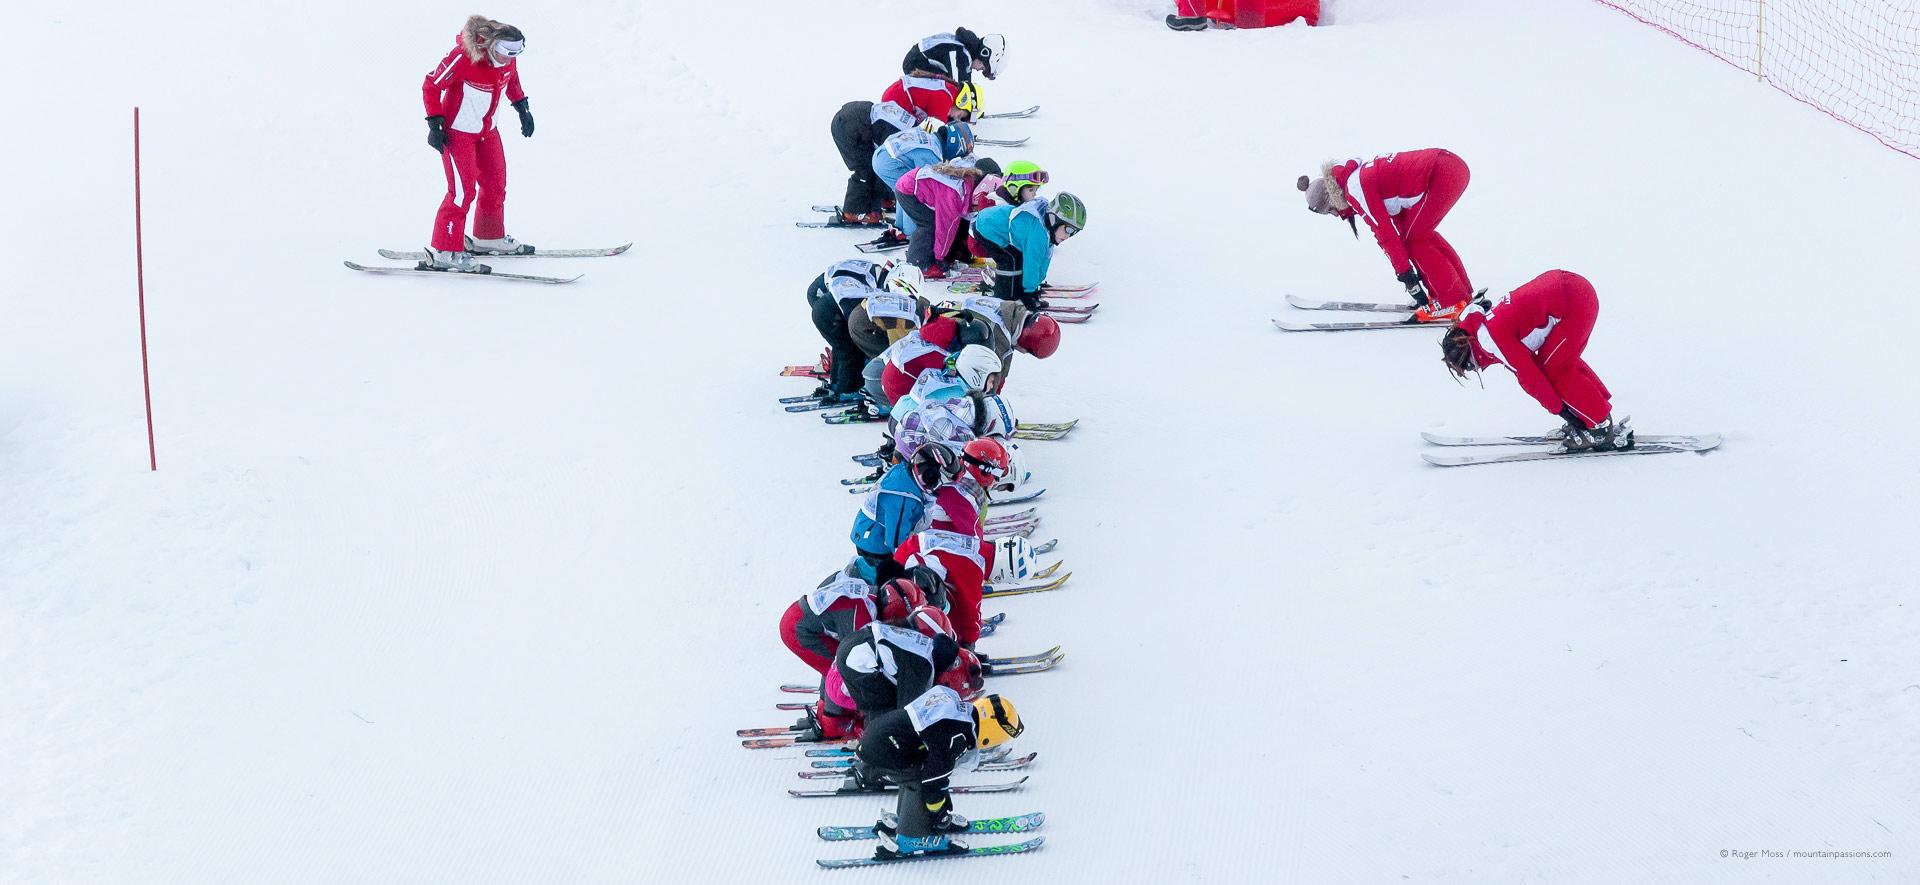 Bird's-eye view of ski instructors teaching children on the snow.